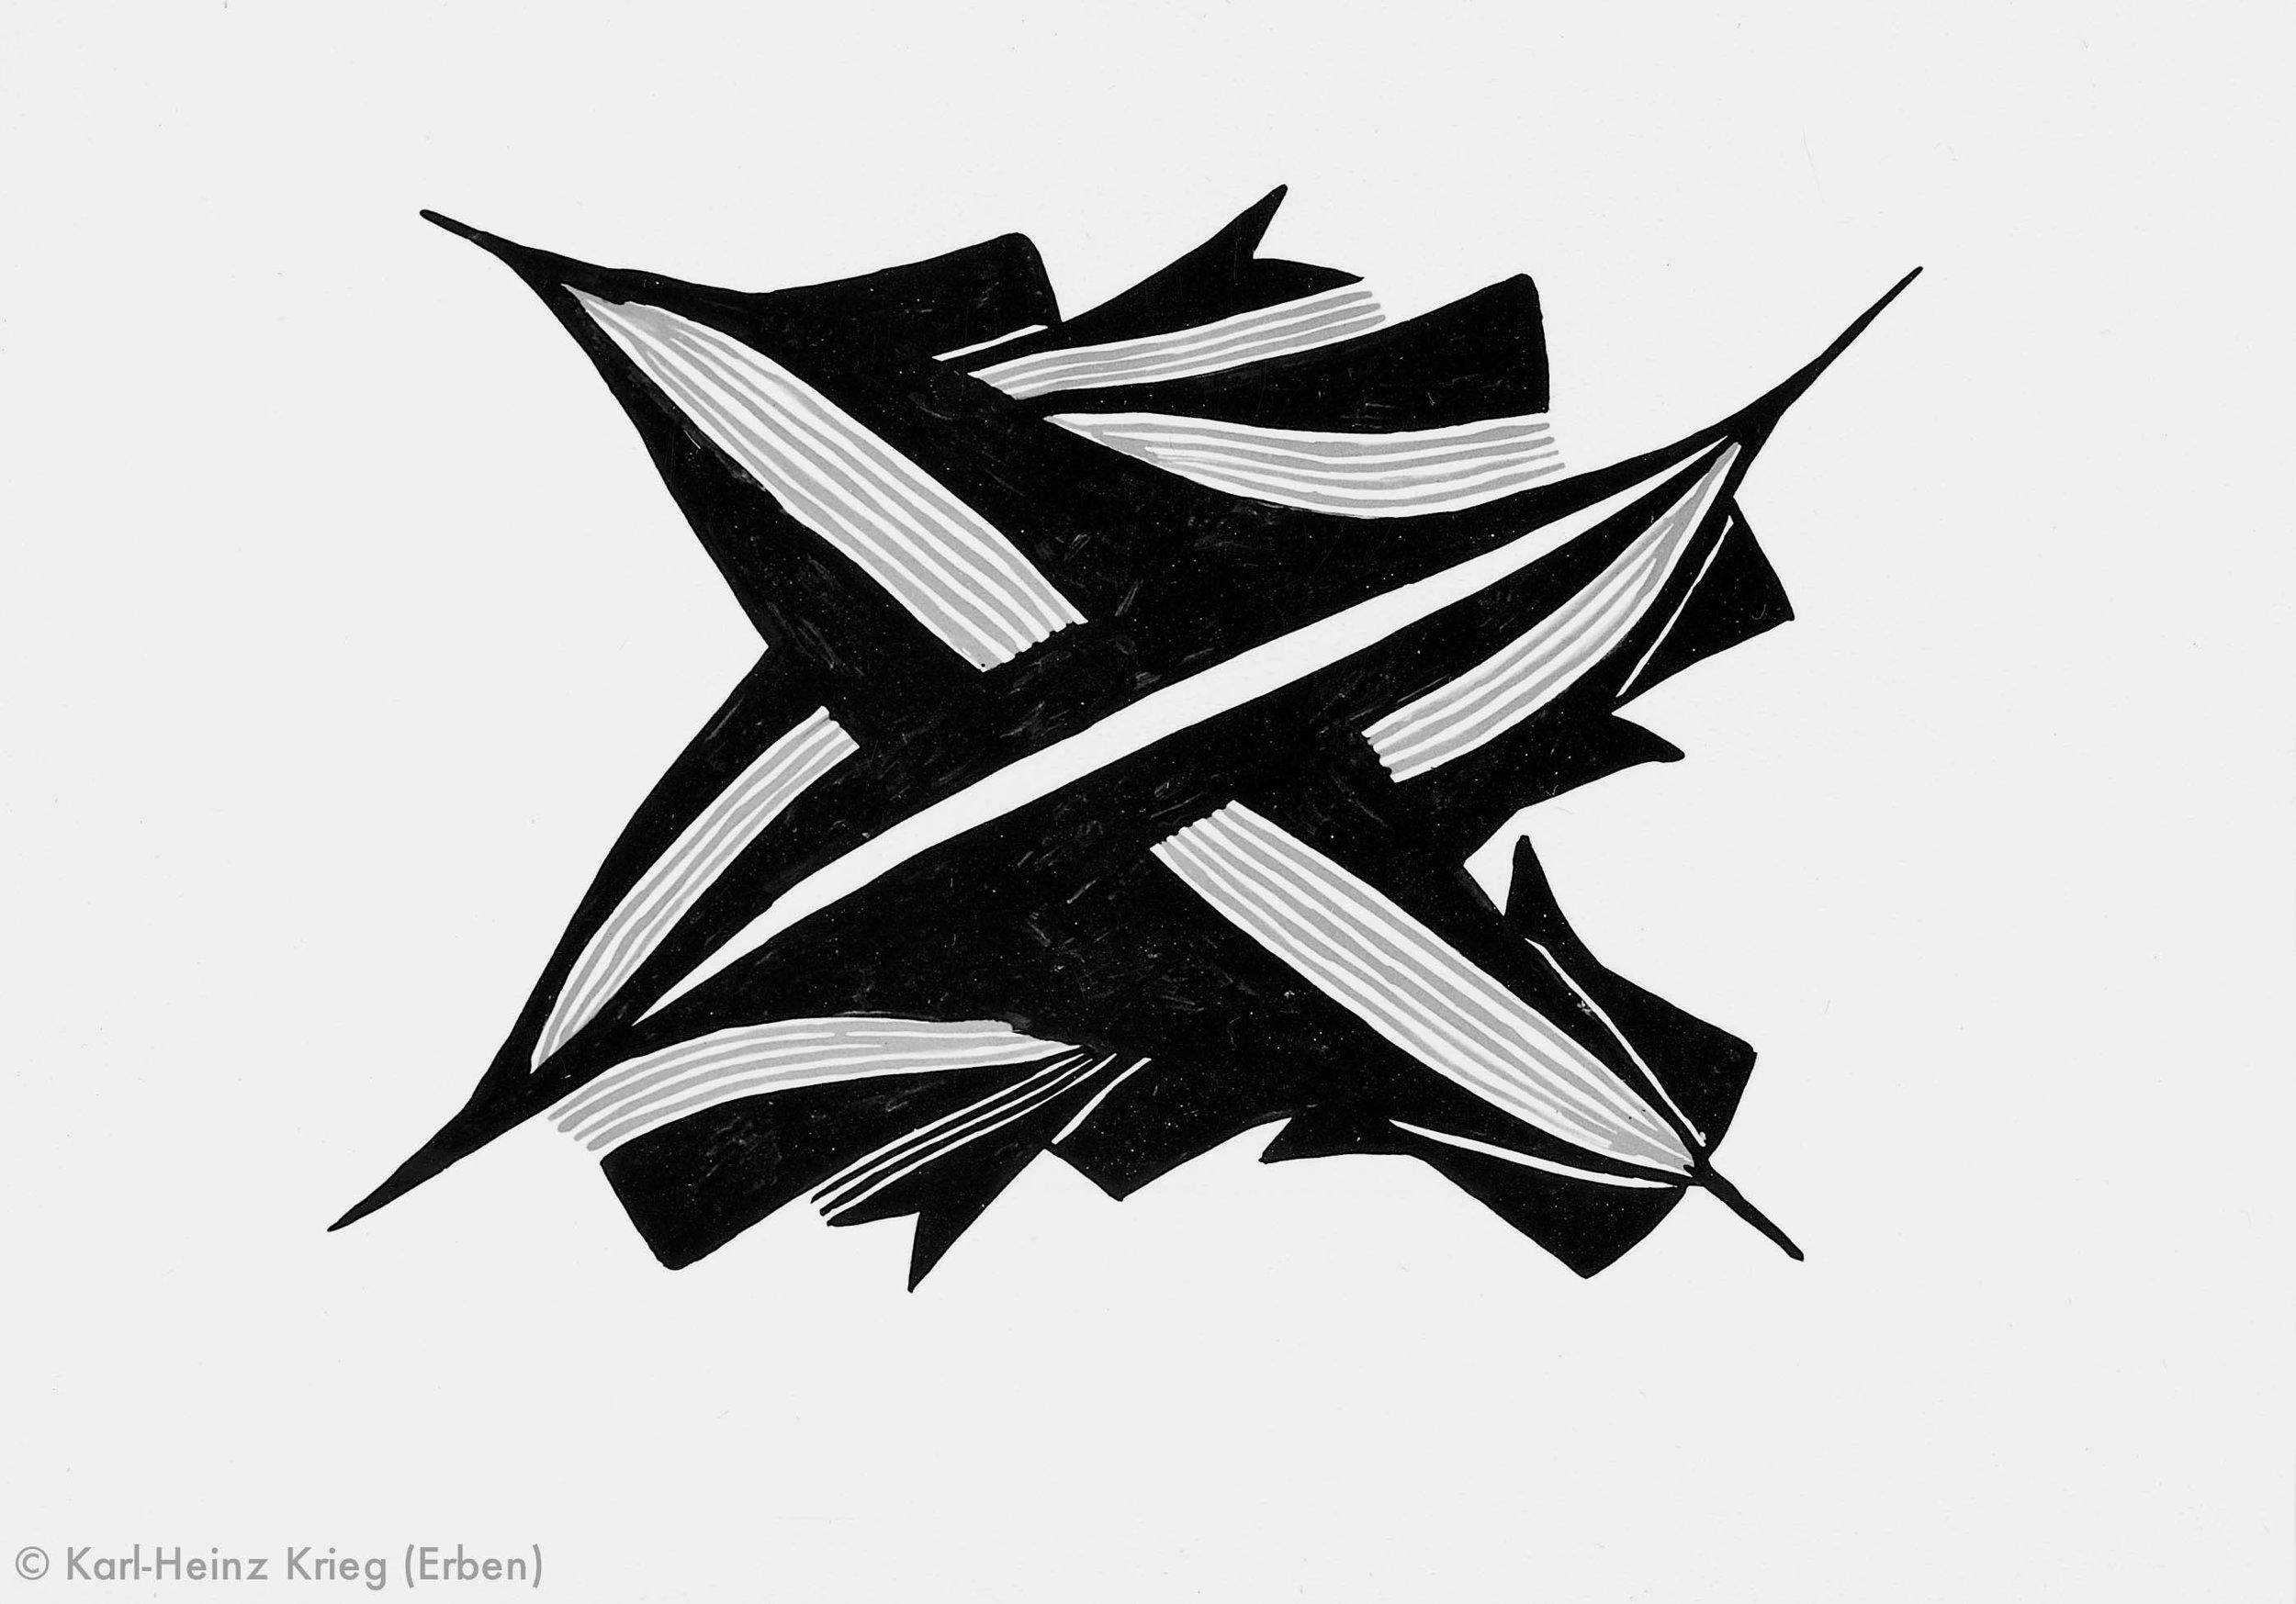 Pévé Zoumanigi Zawagi, 1996 Acryl/Papier, grundiert 83,7 x 59,1 cm Werknr. 39-1996/57